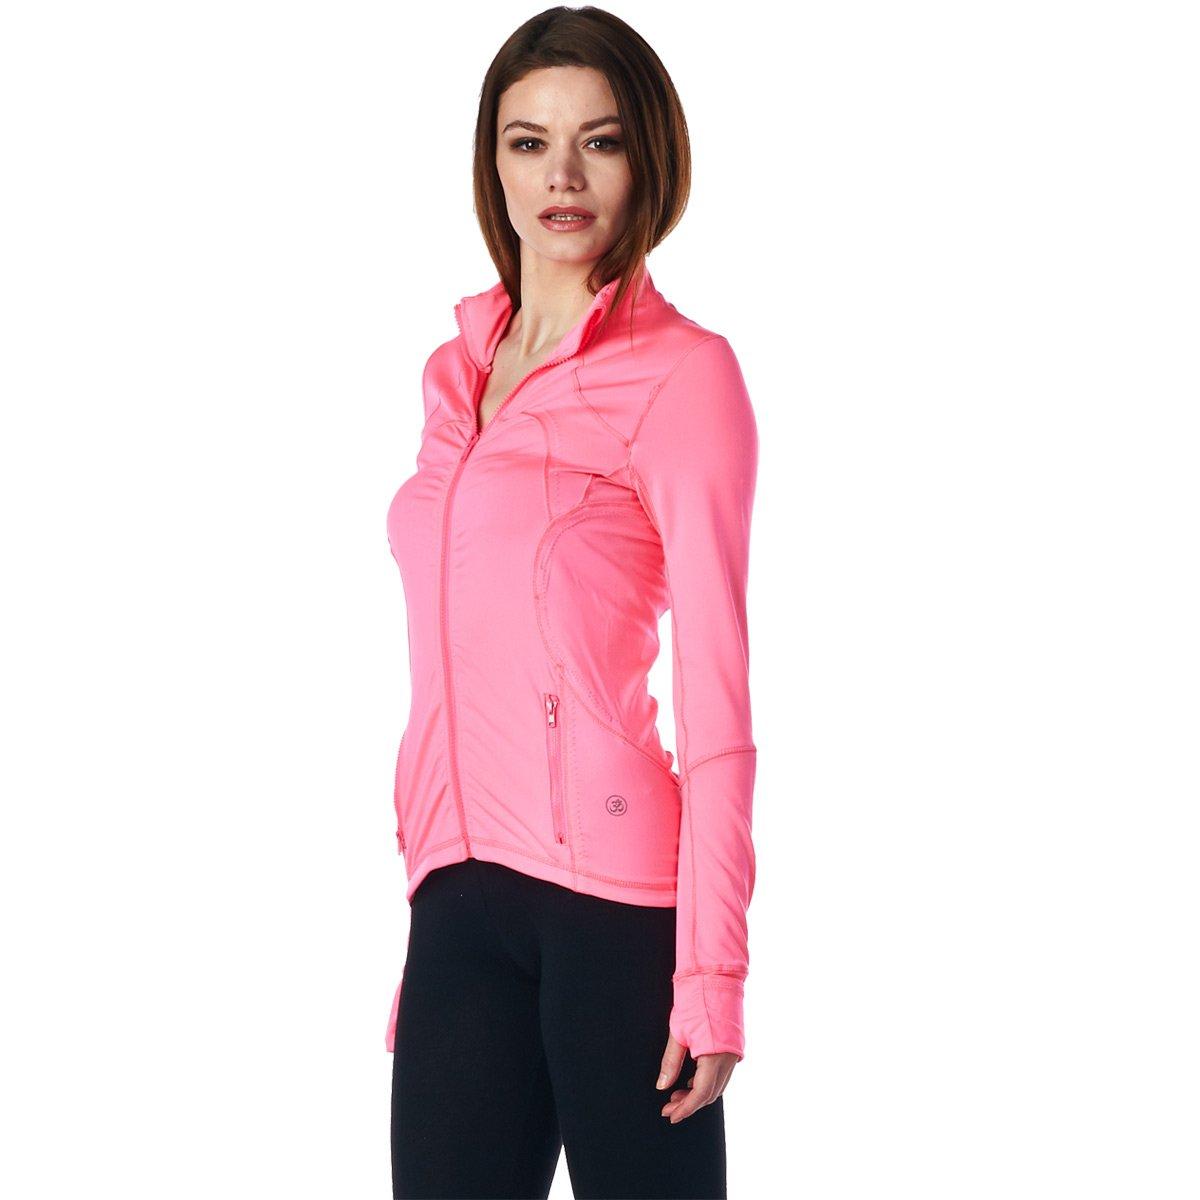 LA Society Womens Yoga Sport Fitness Jacket in Pink - Medium